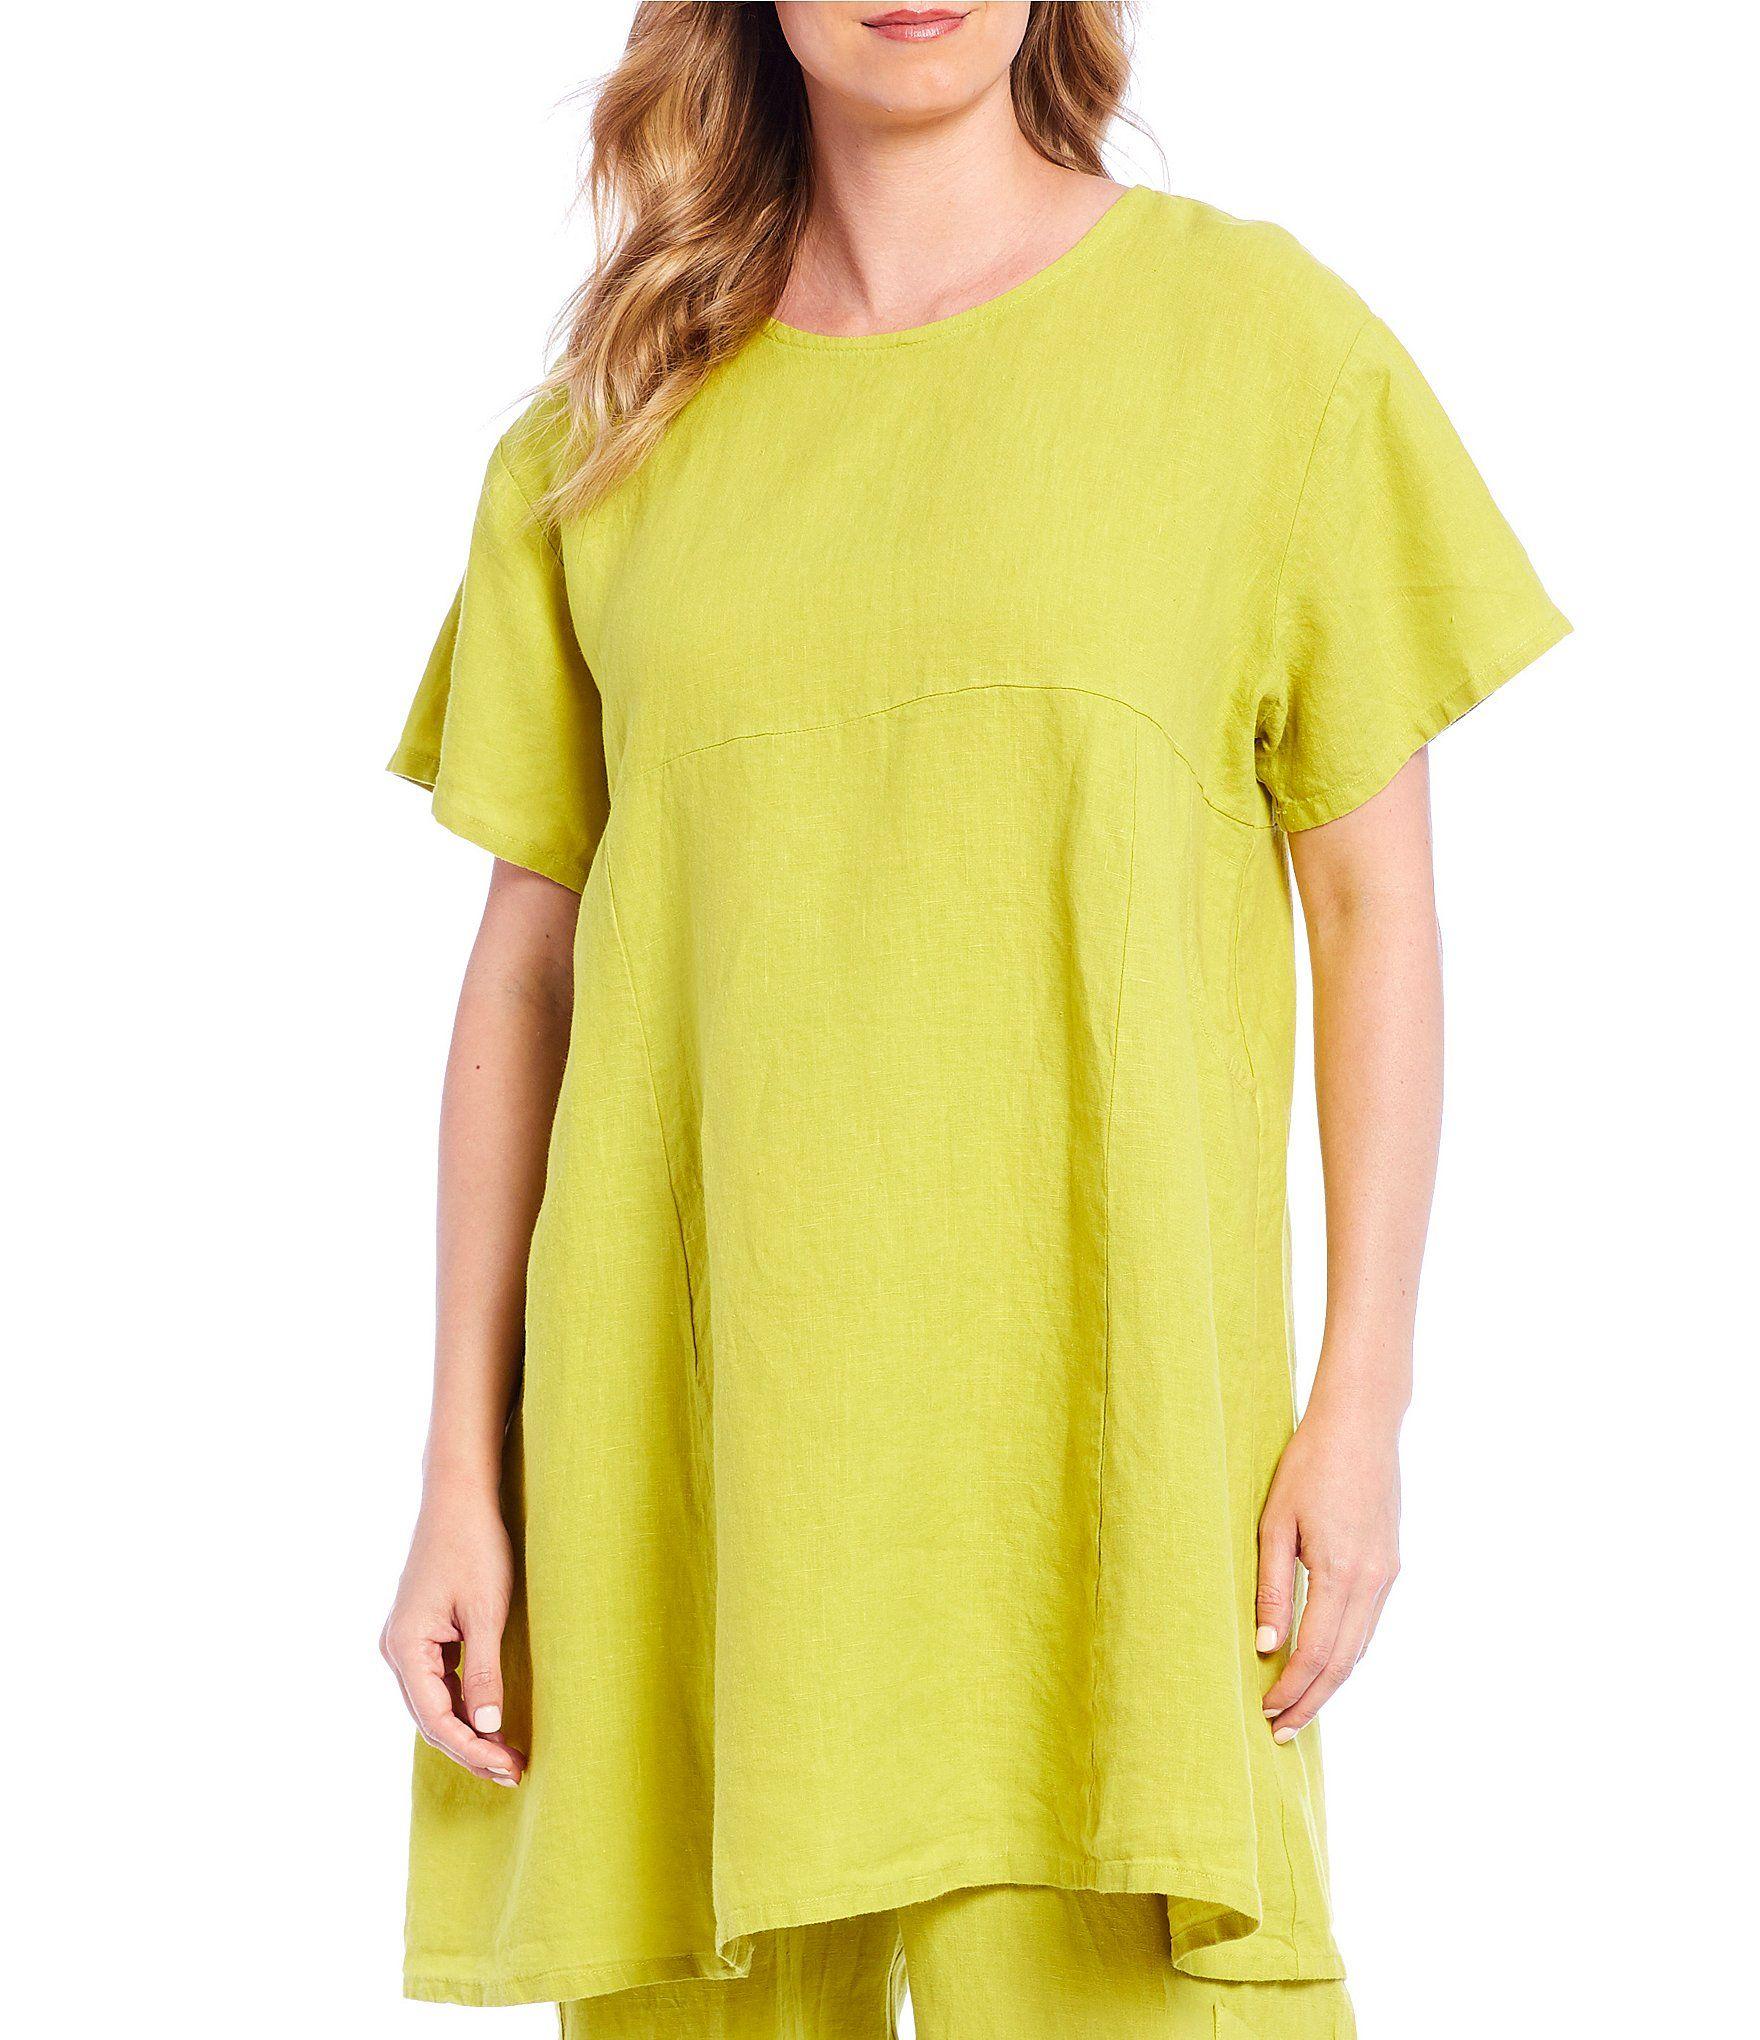 Bryn Walker Mara Short Sleeve Light Linen Tunic - Noni L #linentunic